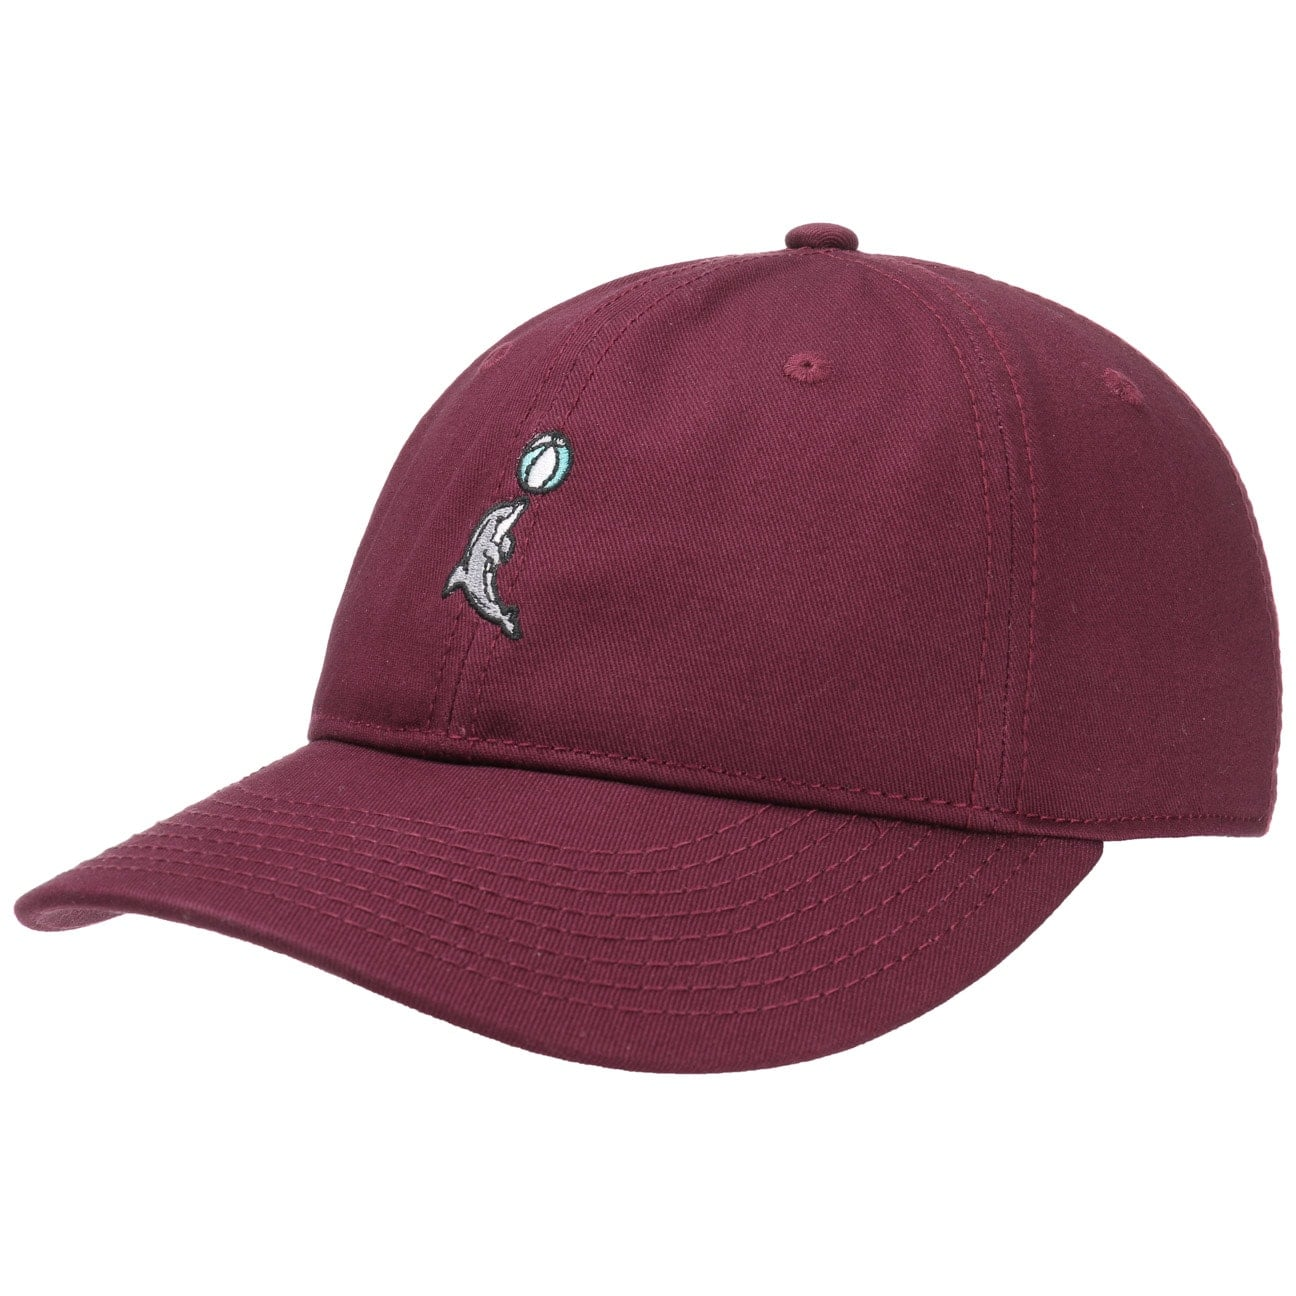 Gorra Dolphin Dad Hat by WEMOTO  gorra de baseball